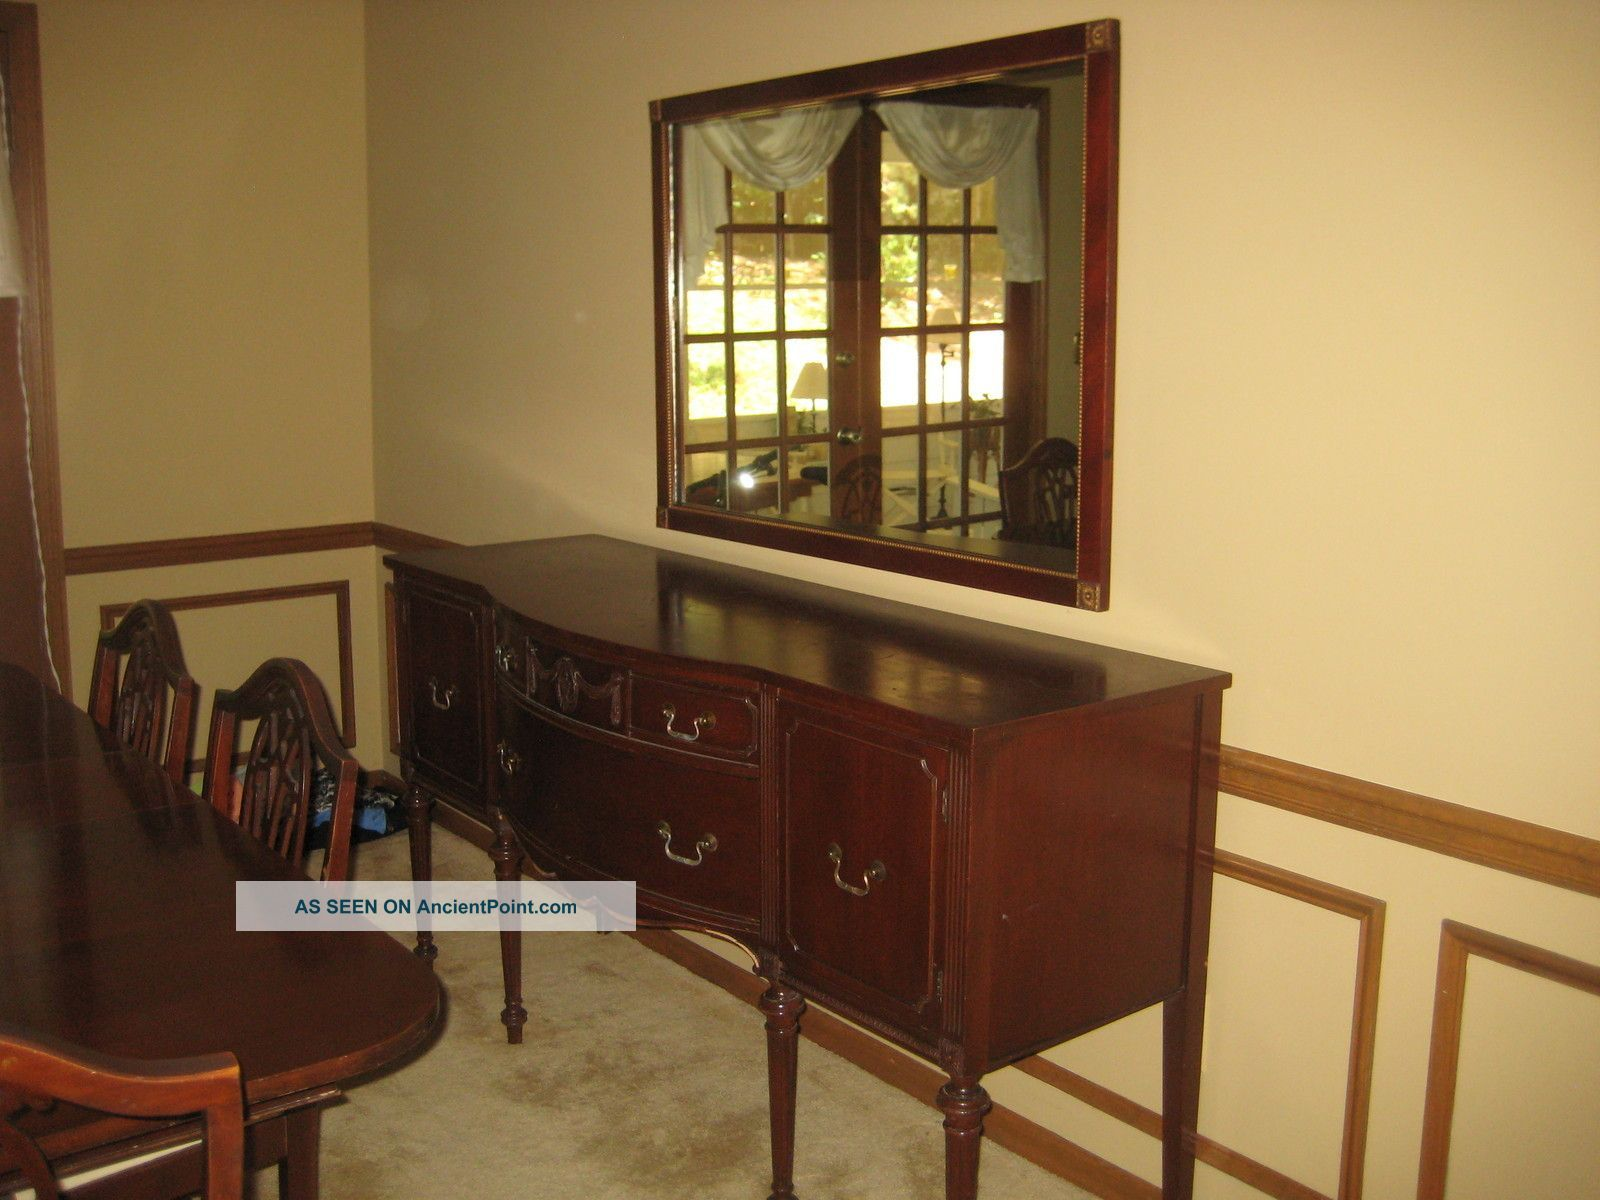 1930 S 1930 S Duncan Phyfe 11 Piece Mahogany Dining Room Set 1900 1950 Dining Room